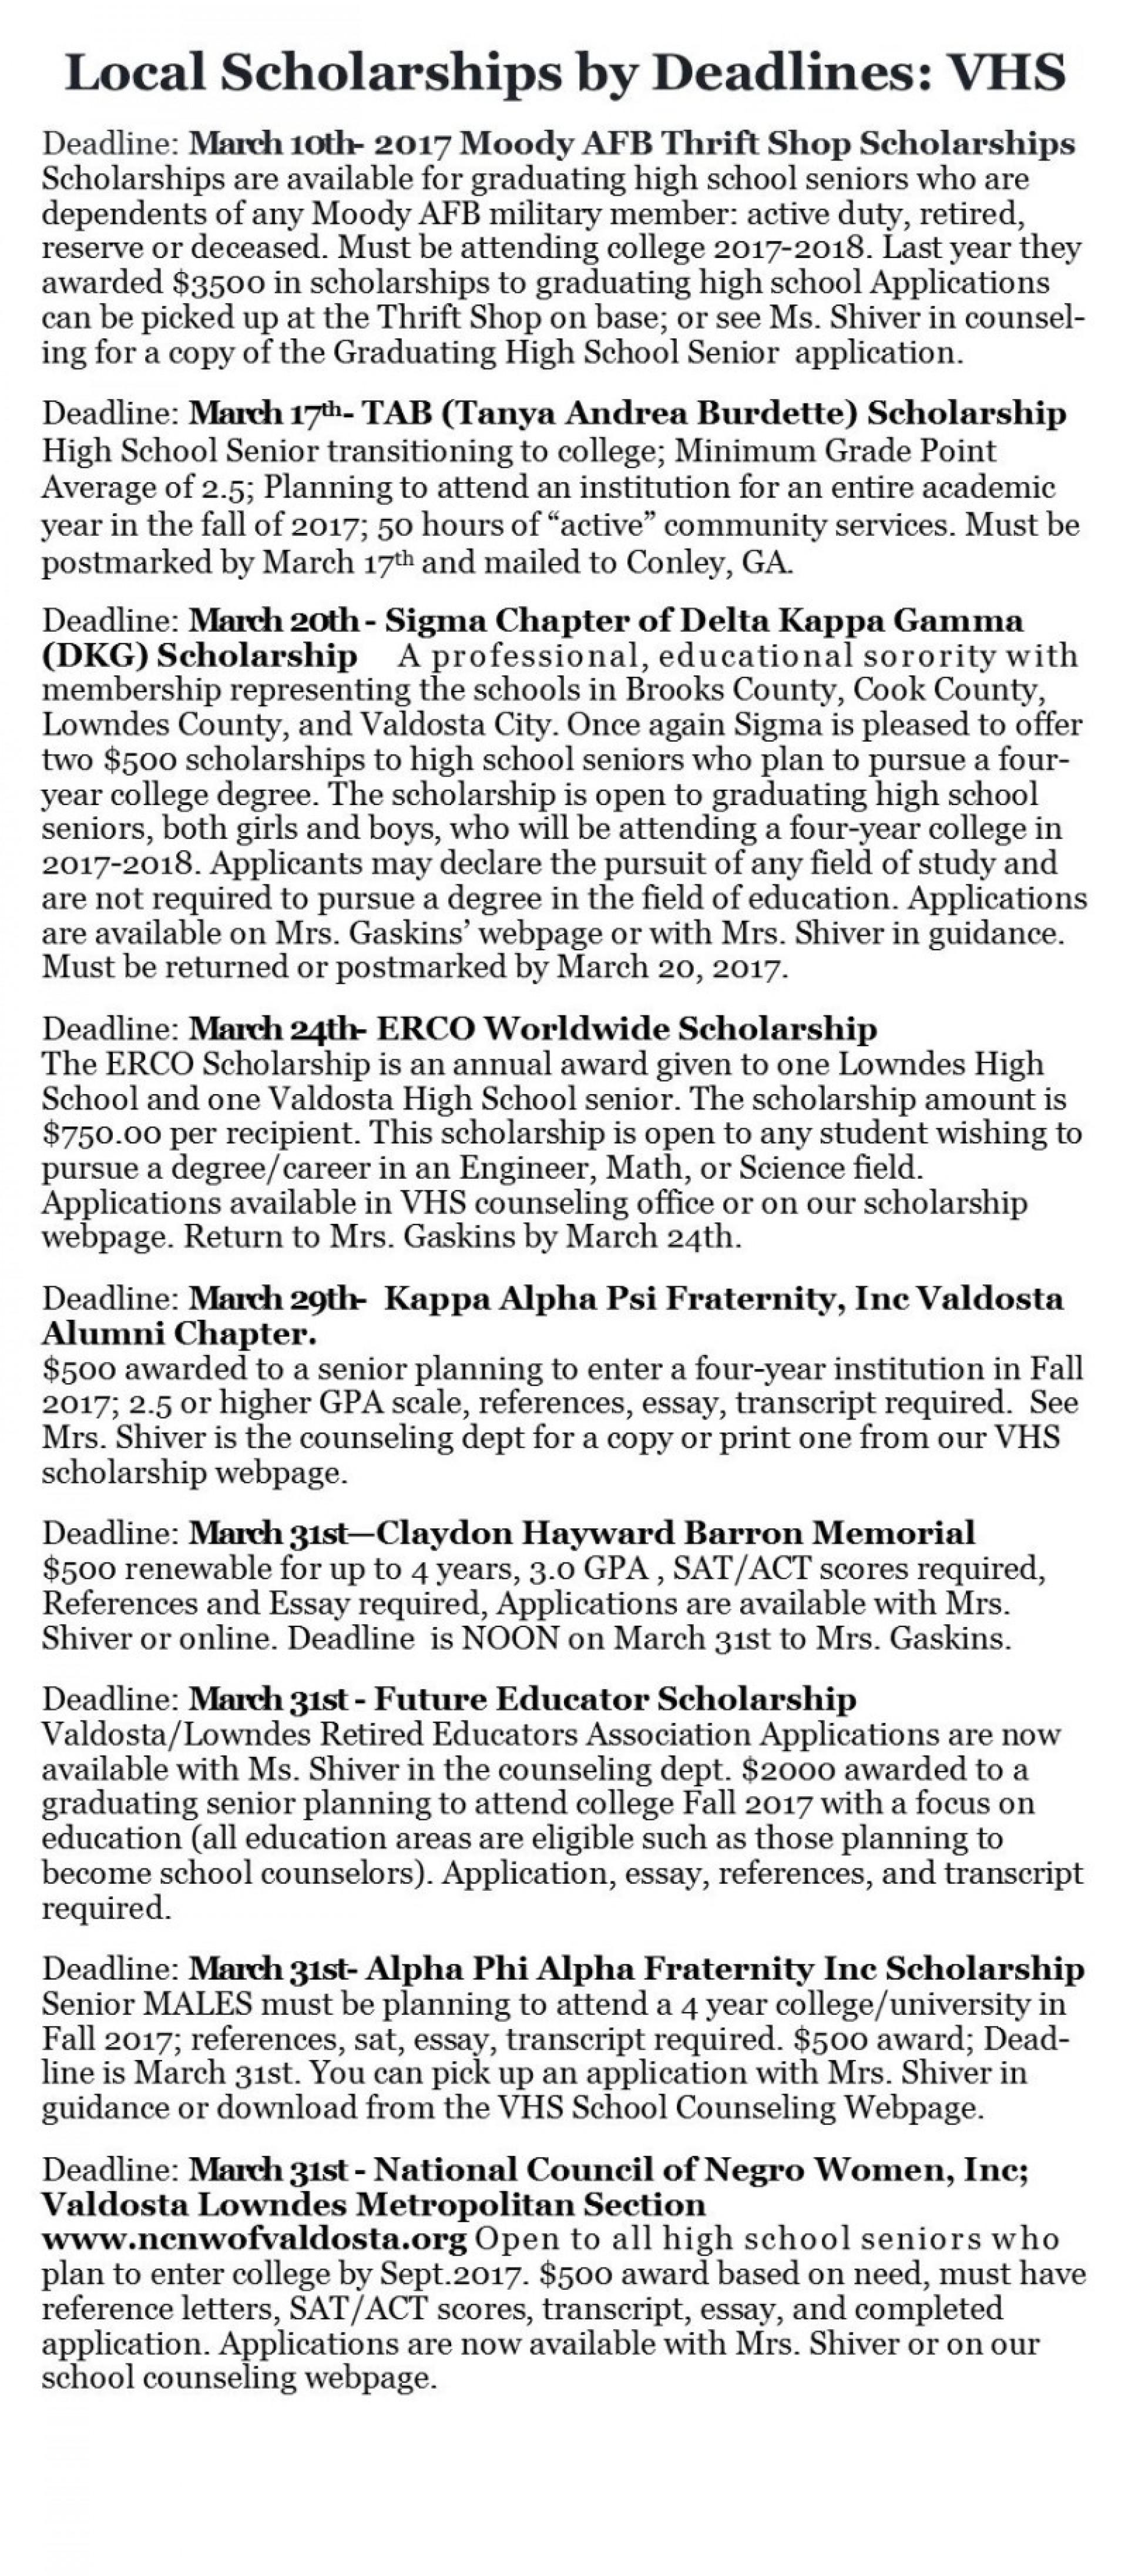 016 Essay Scholarships Tinetby5eqpfuhec2cd5mlc30c12uavsxxp5rodkzqopteukresize8002c1827ssl1 Wonderful 2017 No College Canada 1920